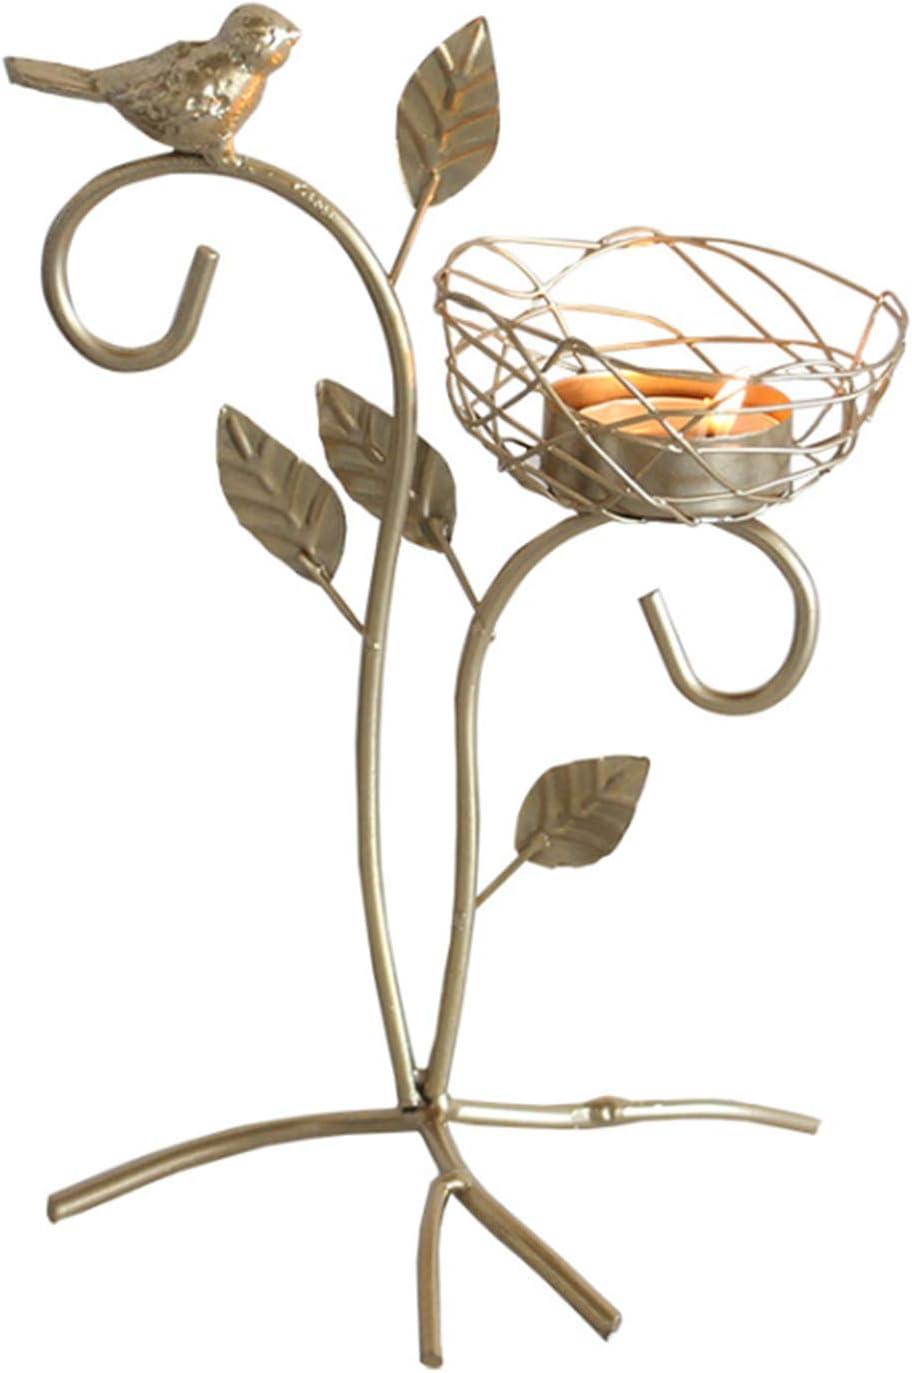 MOLECOLE Golden Bird Candle Holders, Vintage Home Decor Centerpiece Candle Stands, Tabletop Decorative TeaLight Candlestick, Iron Candelabrum